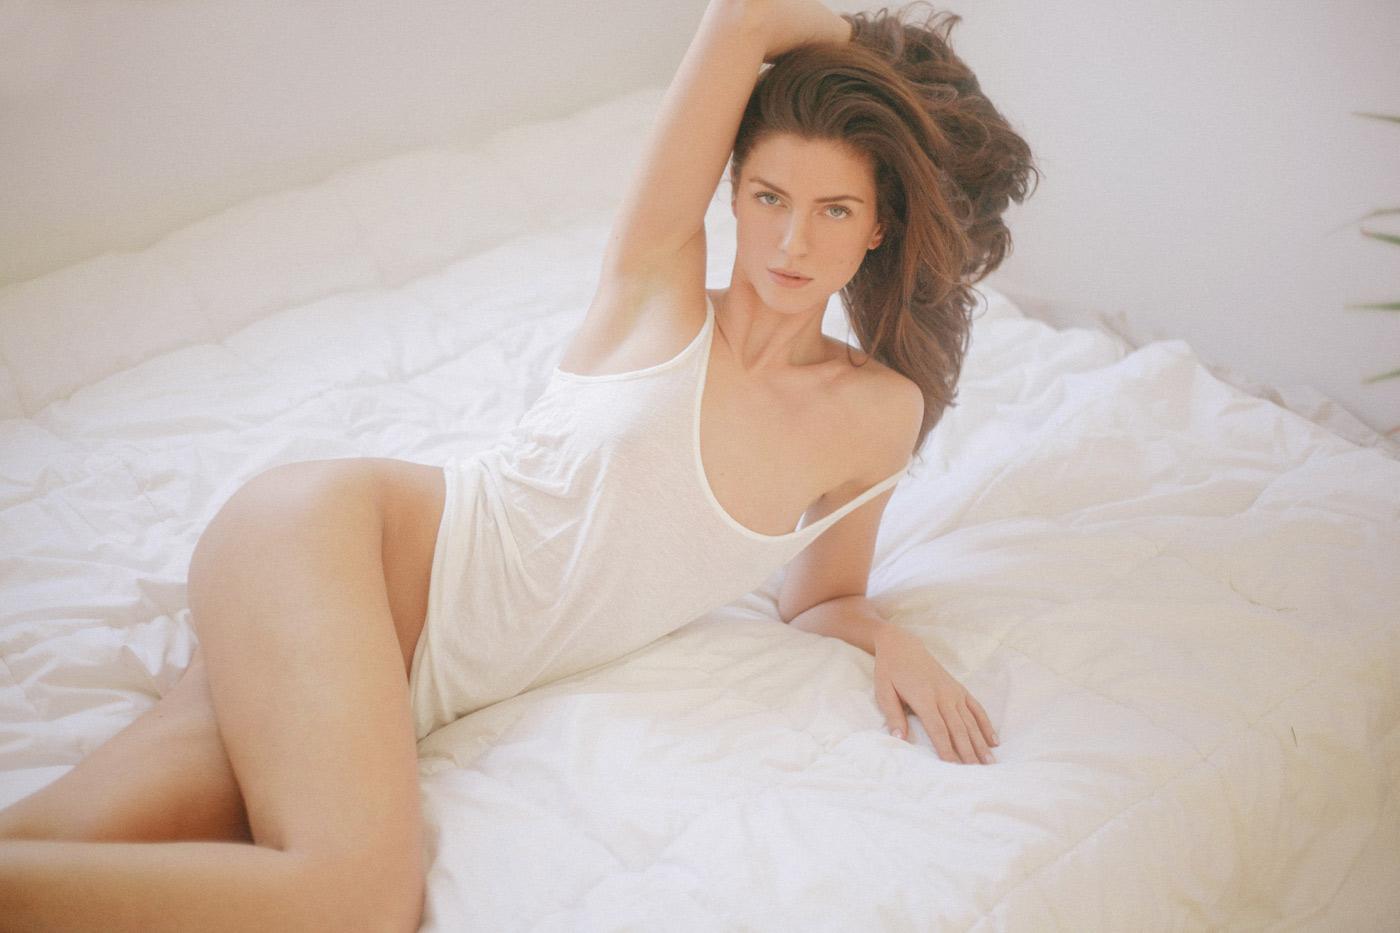 Photos Cameron Davis nudes (56 photo), Tits, Bikini, Instagram, braless 2019